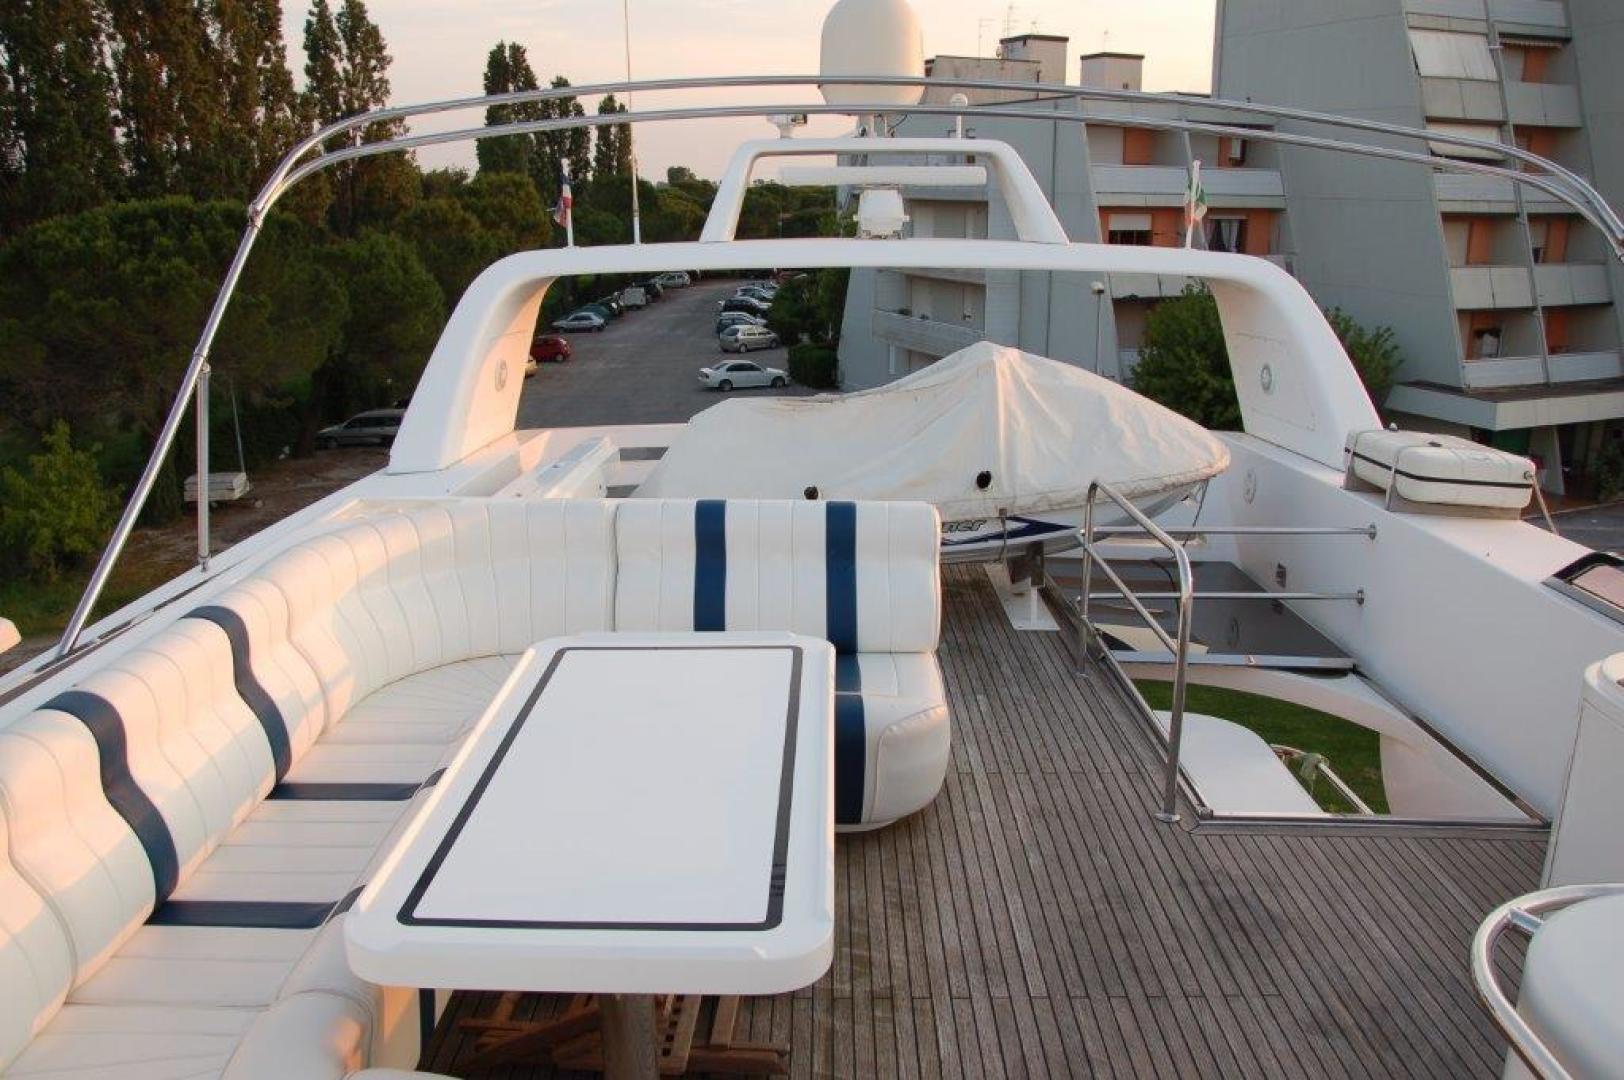 Elegance-70 Motor Yacht 1998 -Italy-1171274 | Thumbnail